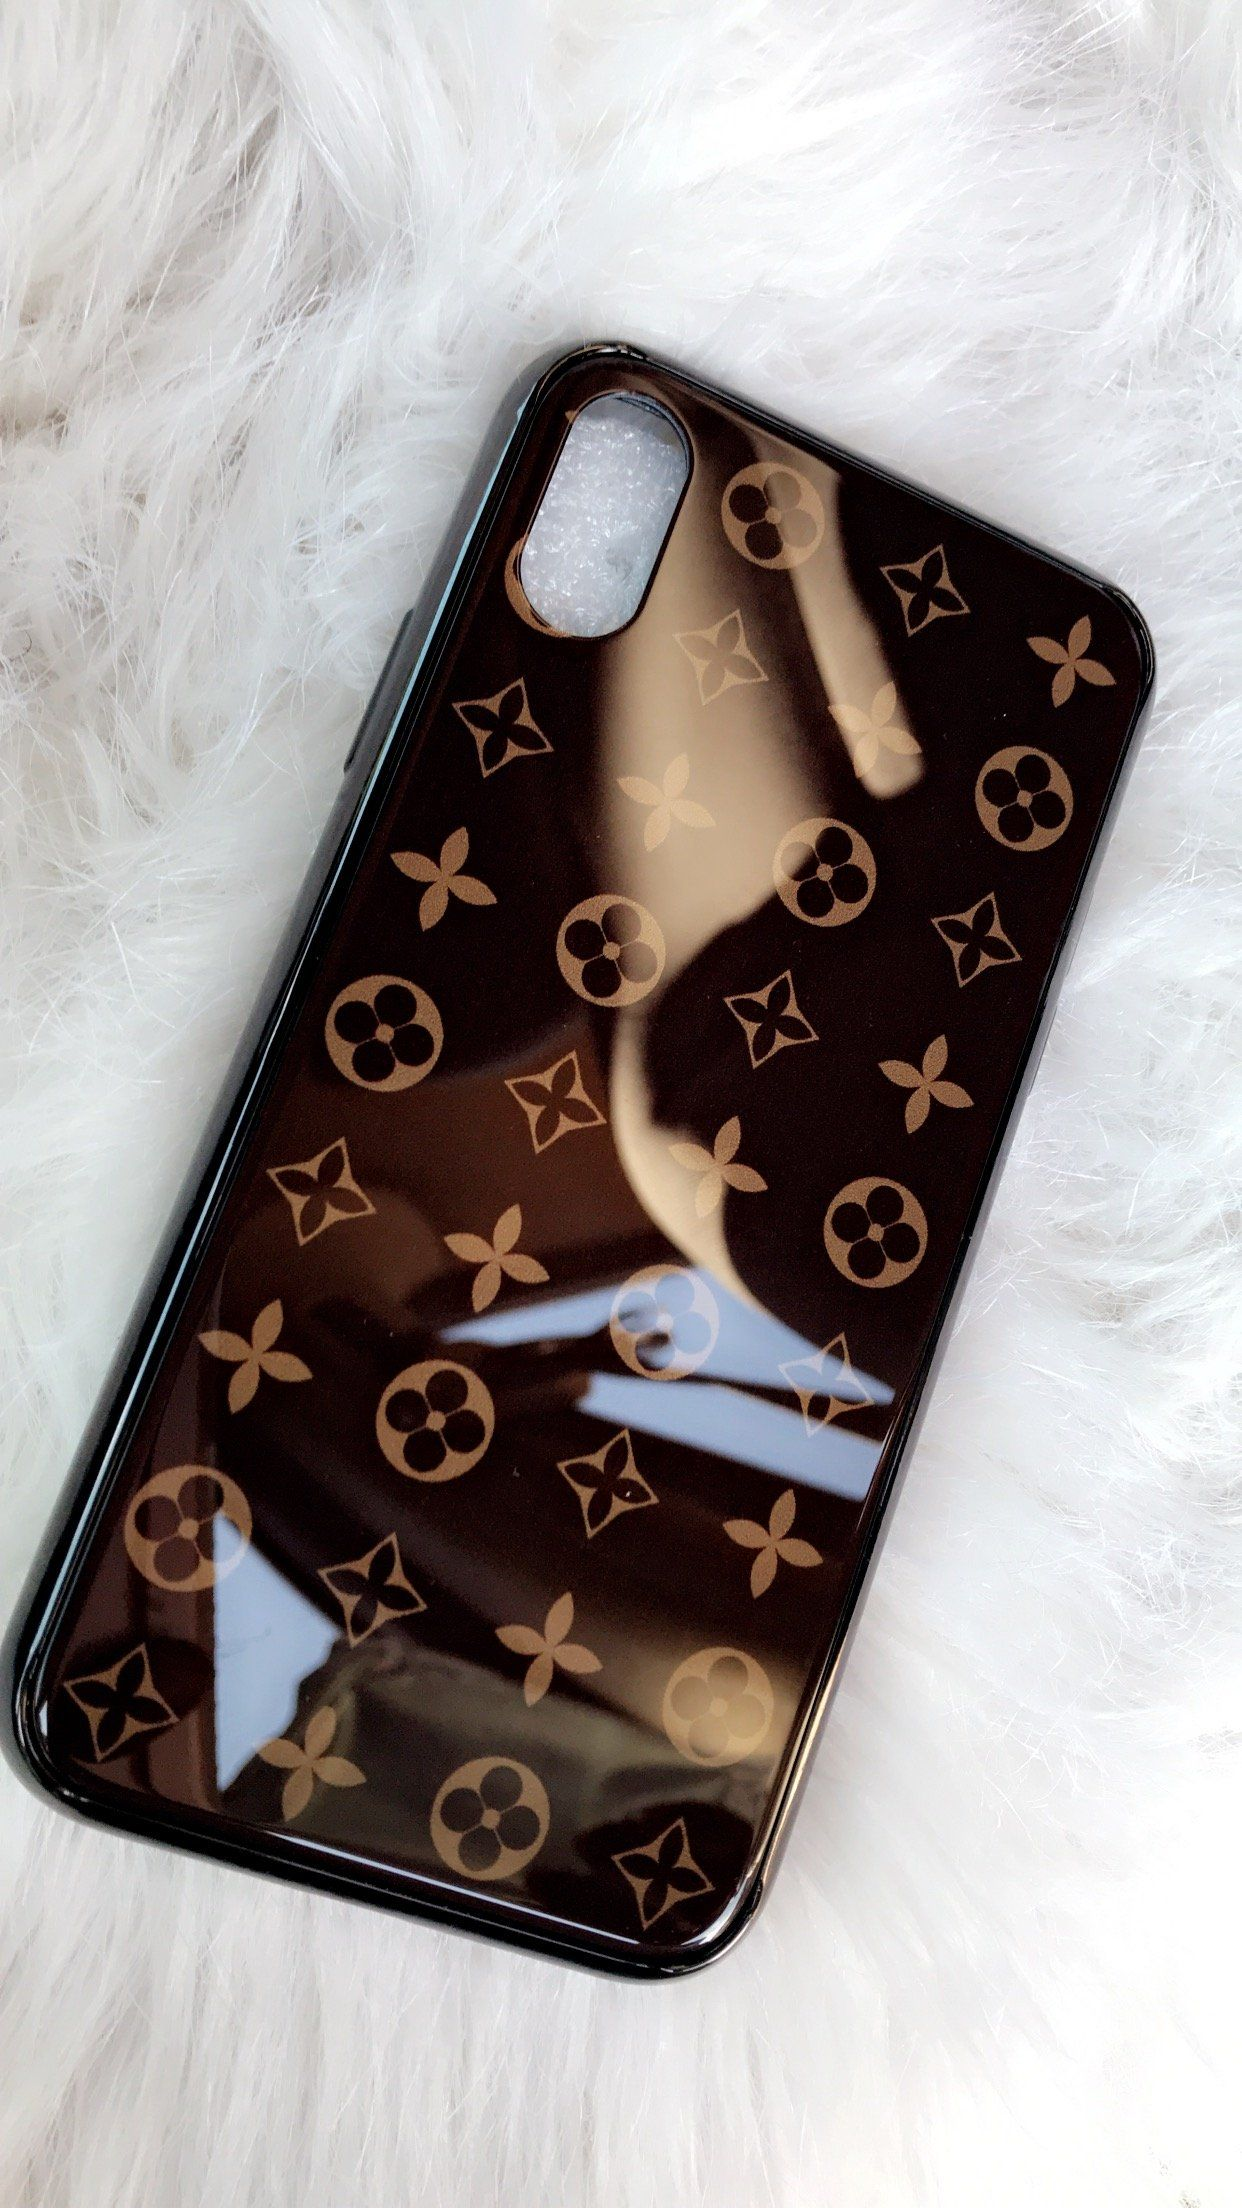 Iphone X Louis Vuitton Case Trendy Iphone Cases Louis Vuitton Phone Case Phone Case Accessories